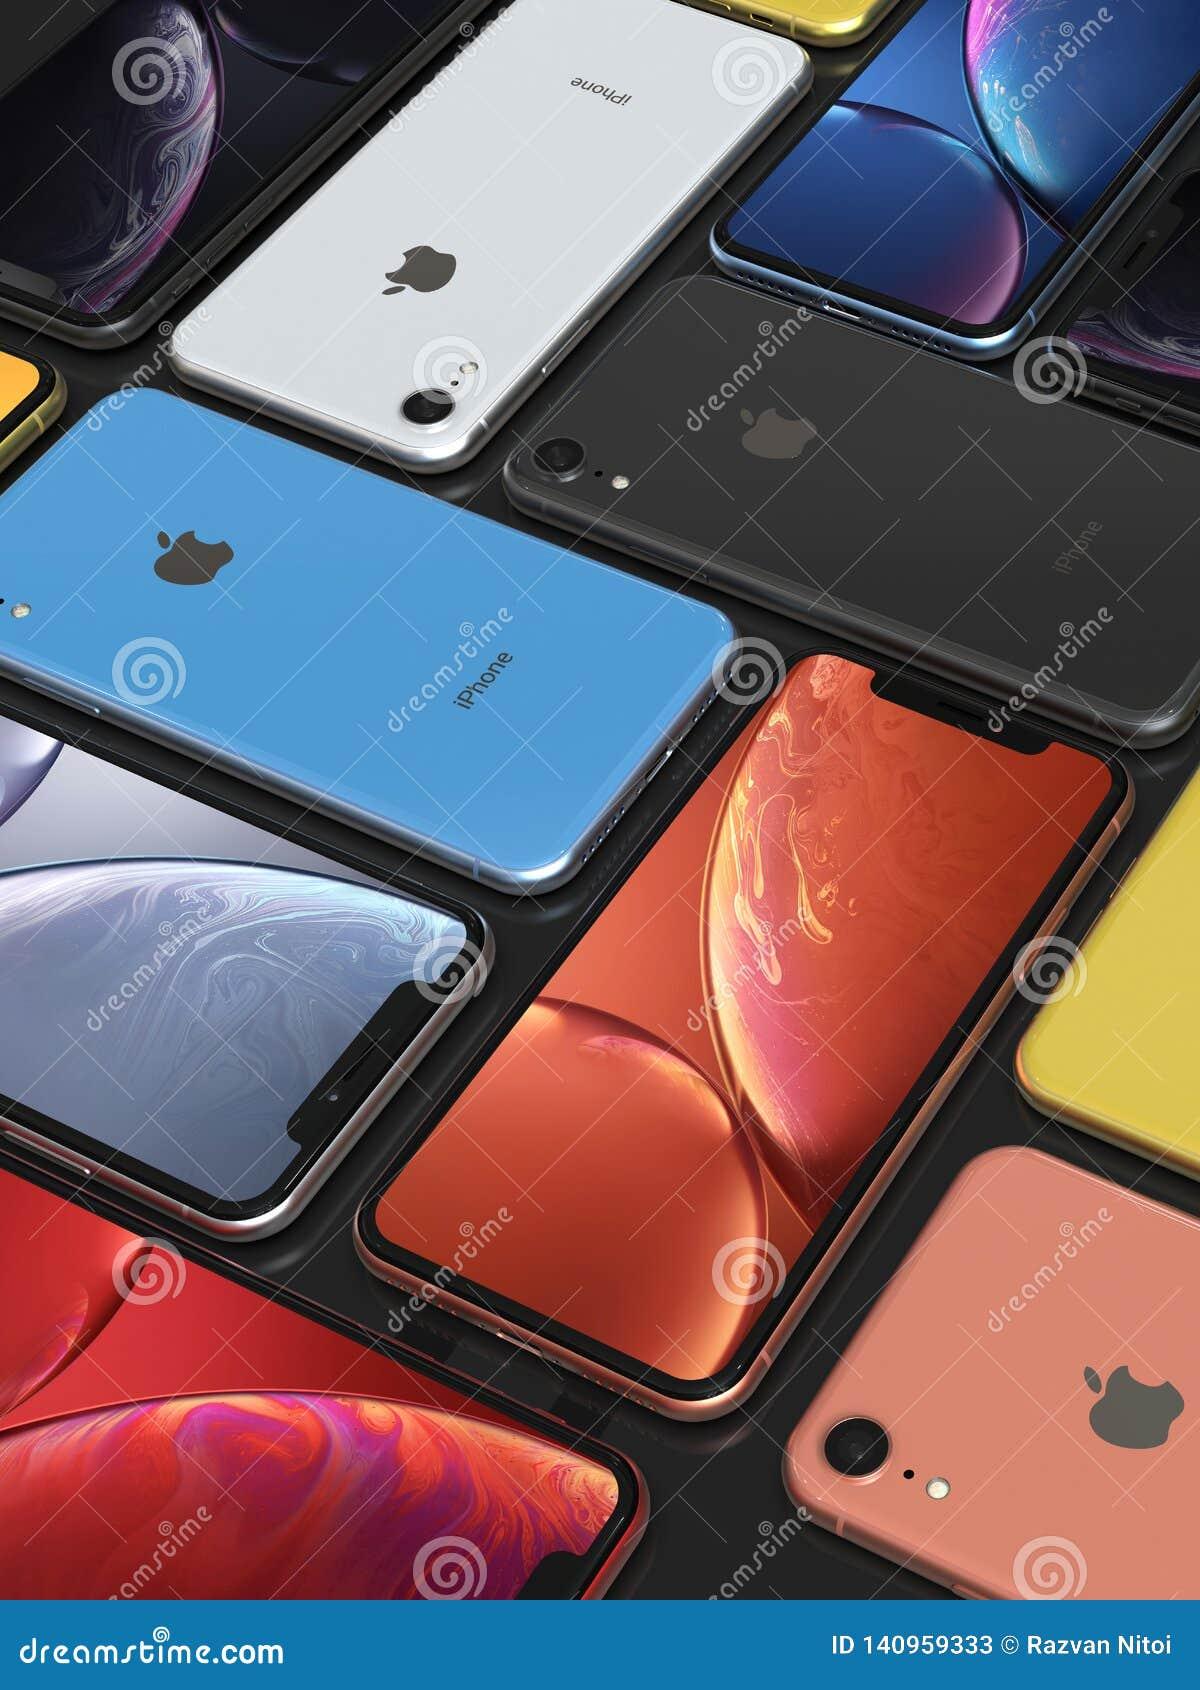 Apple Iphone Xr All Colours Mosaic Arrangement Original